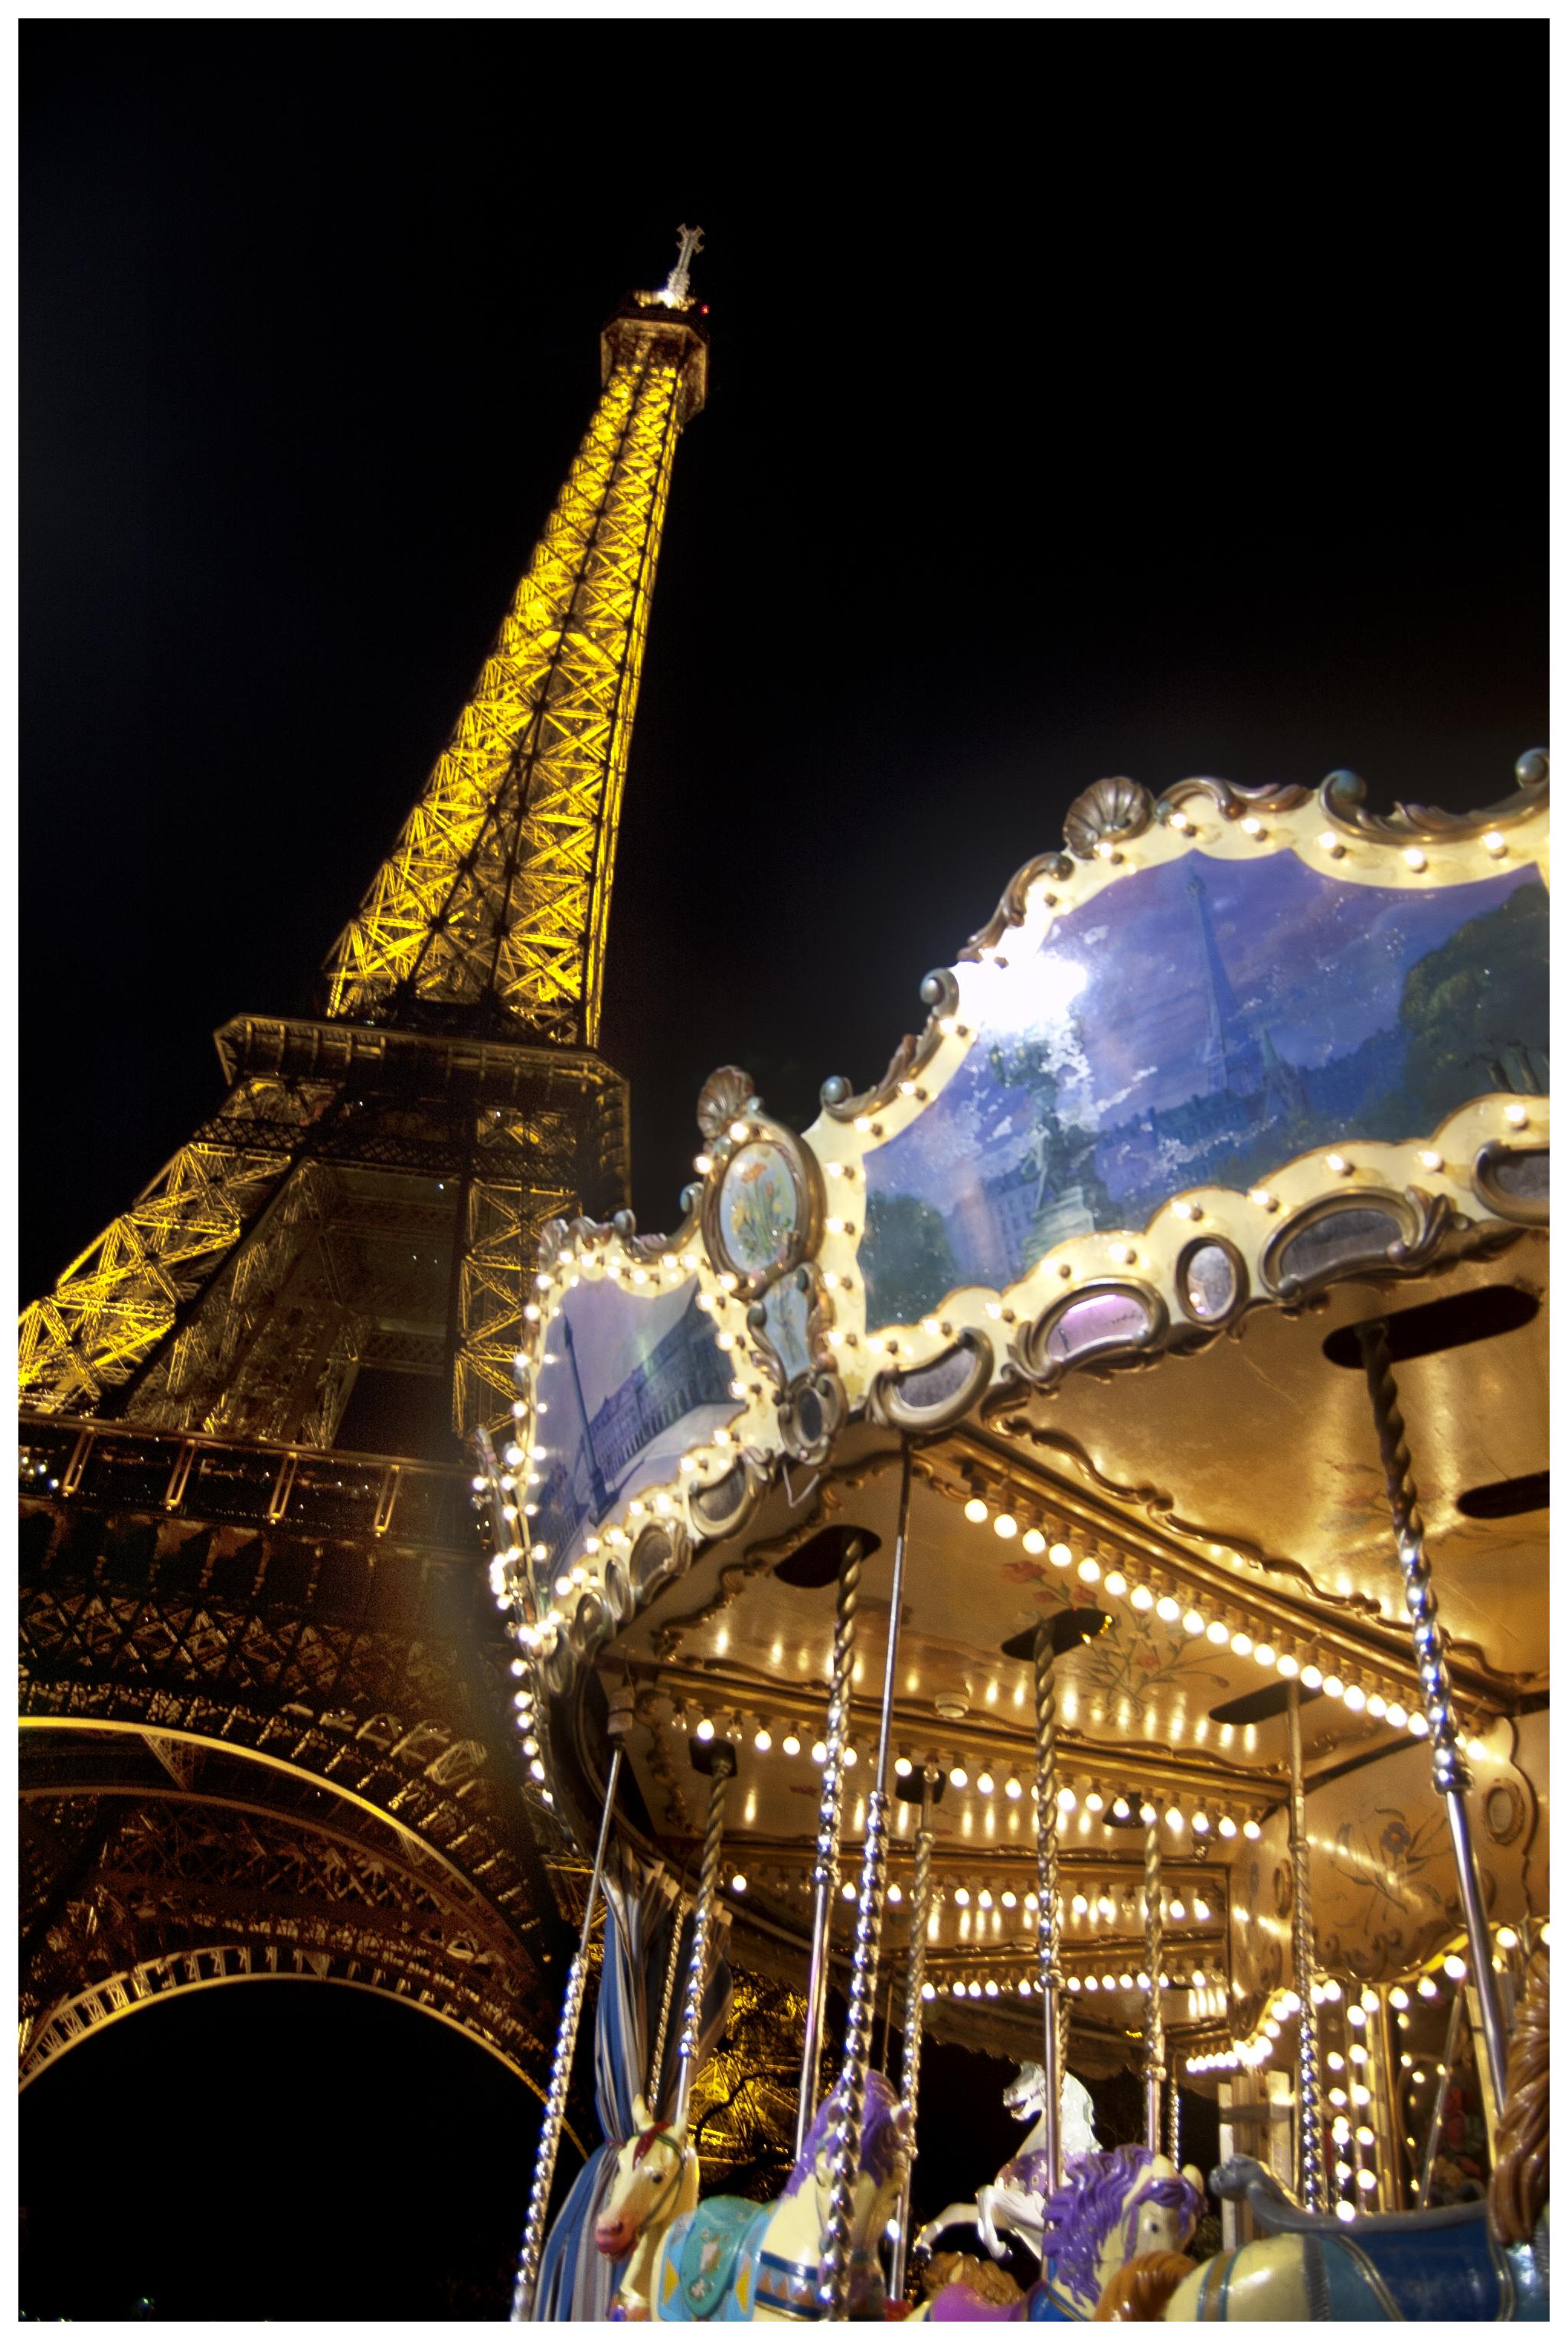 Night shot of Carrousel de la Tour Eiffel